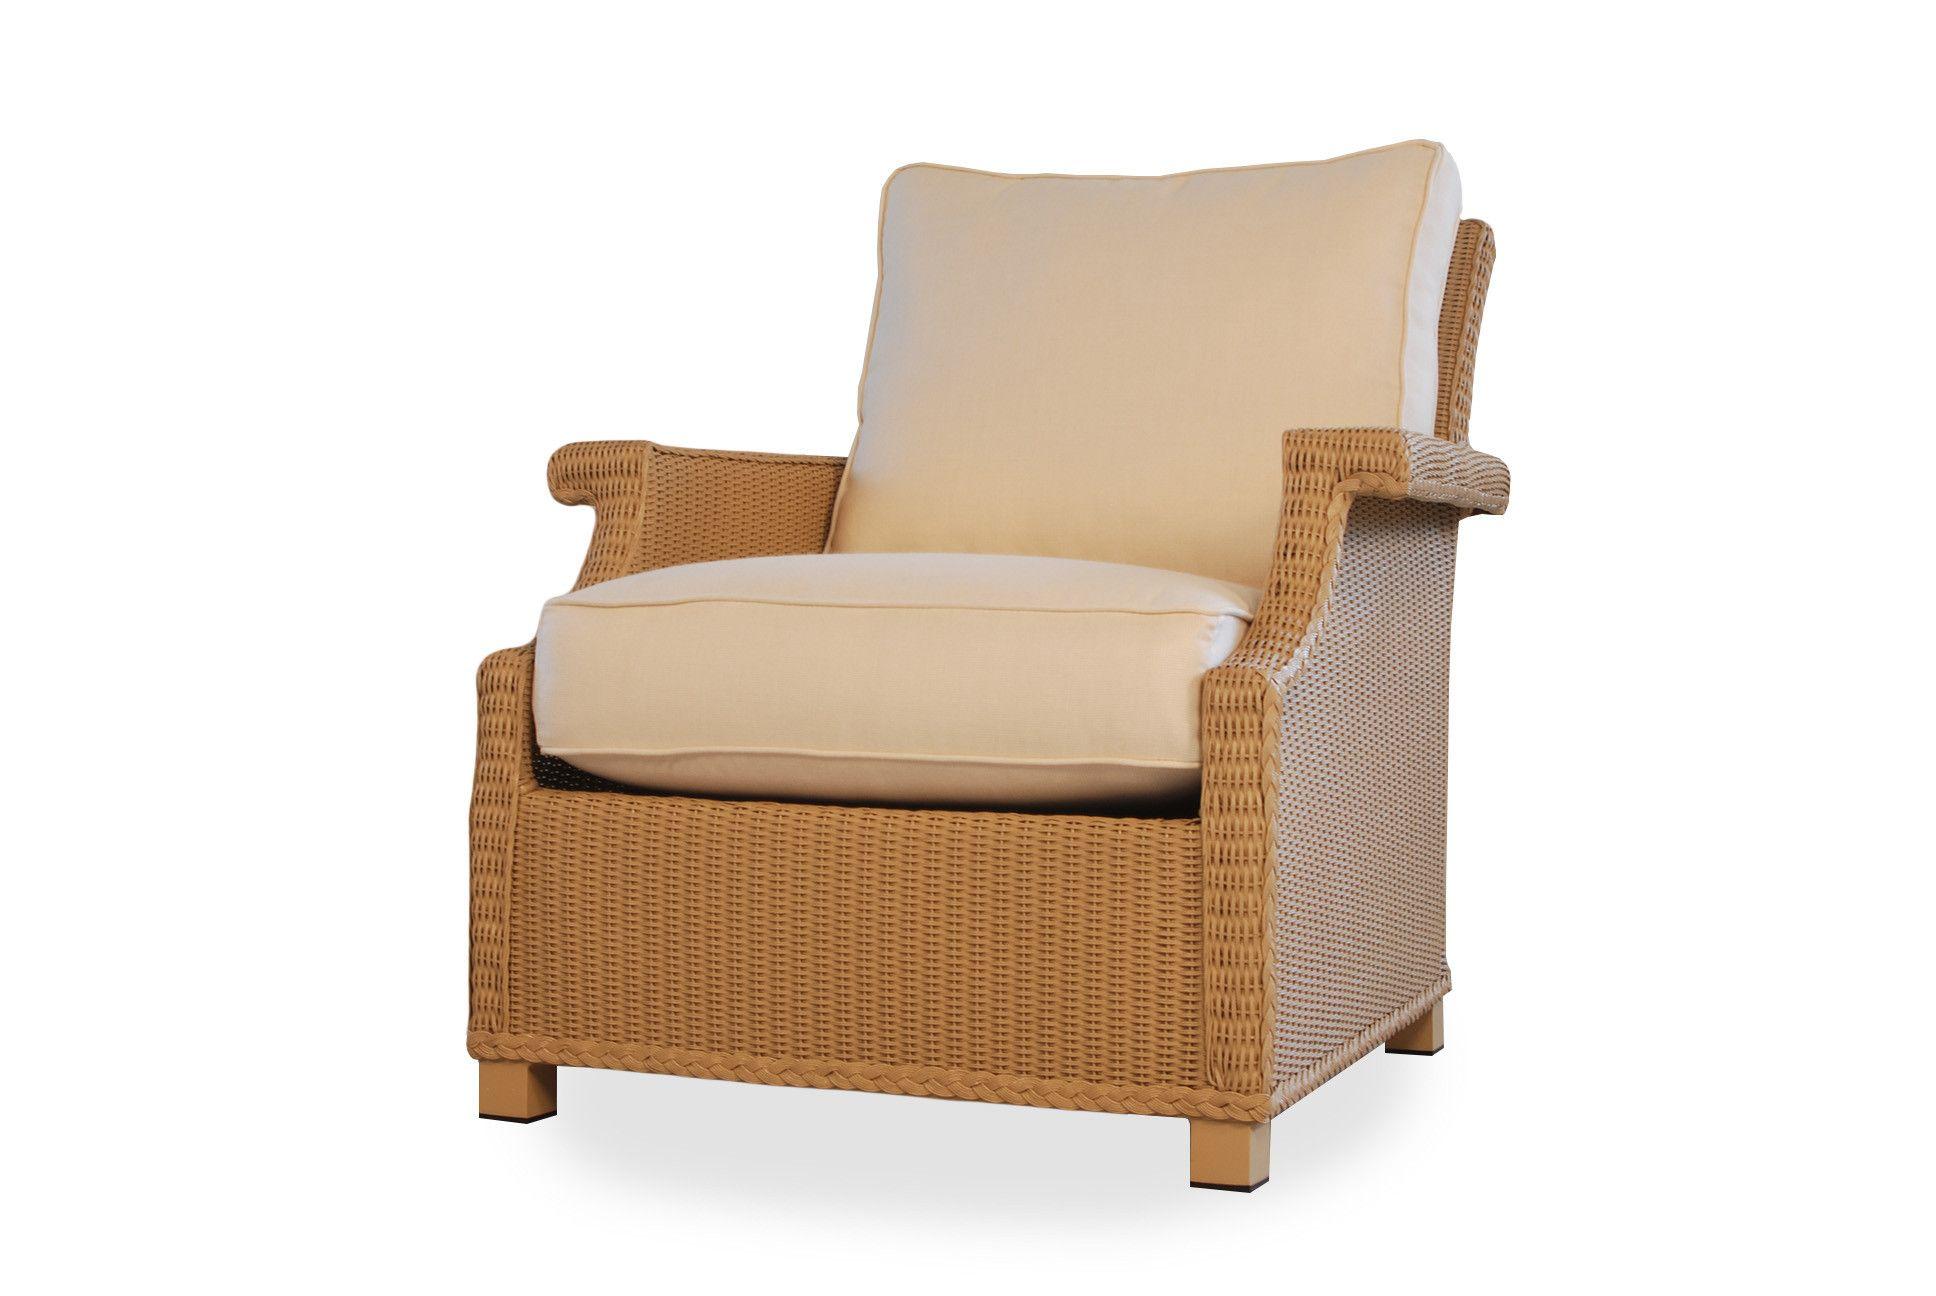 Lloyd flanders hamptons wicker deep lounge chair with